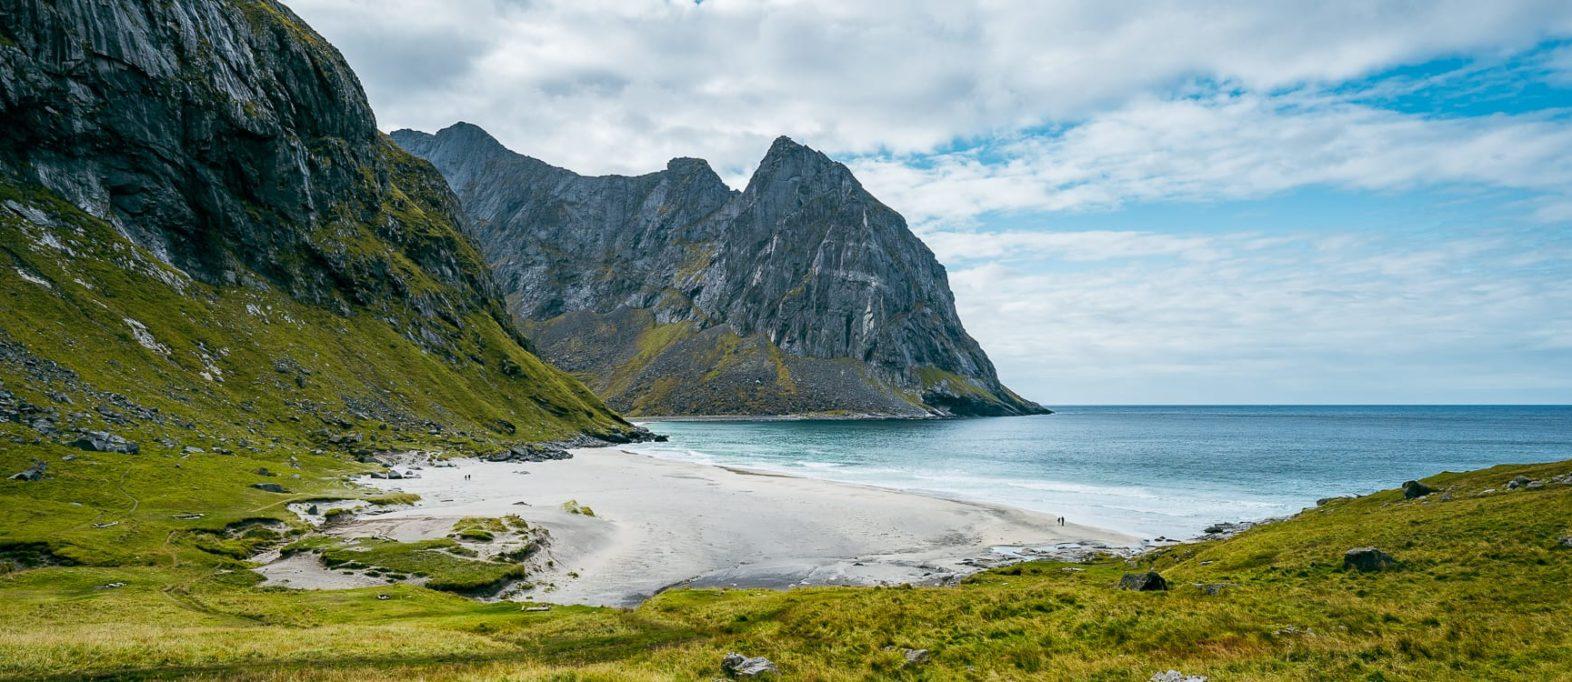 Kvalvika Beach Wanderung Lofoten Norwegen